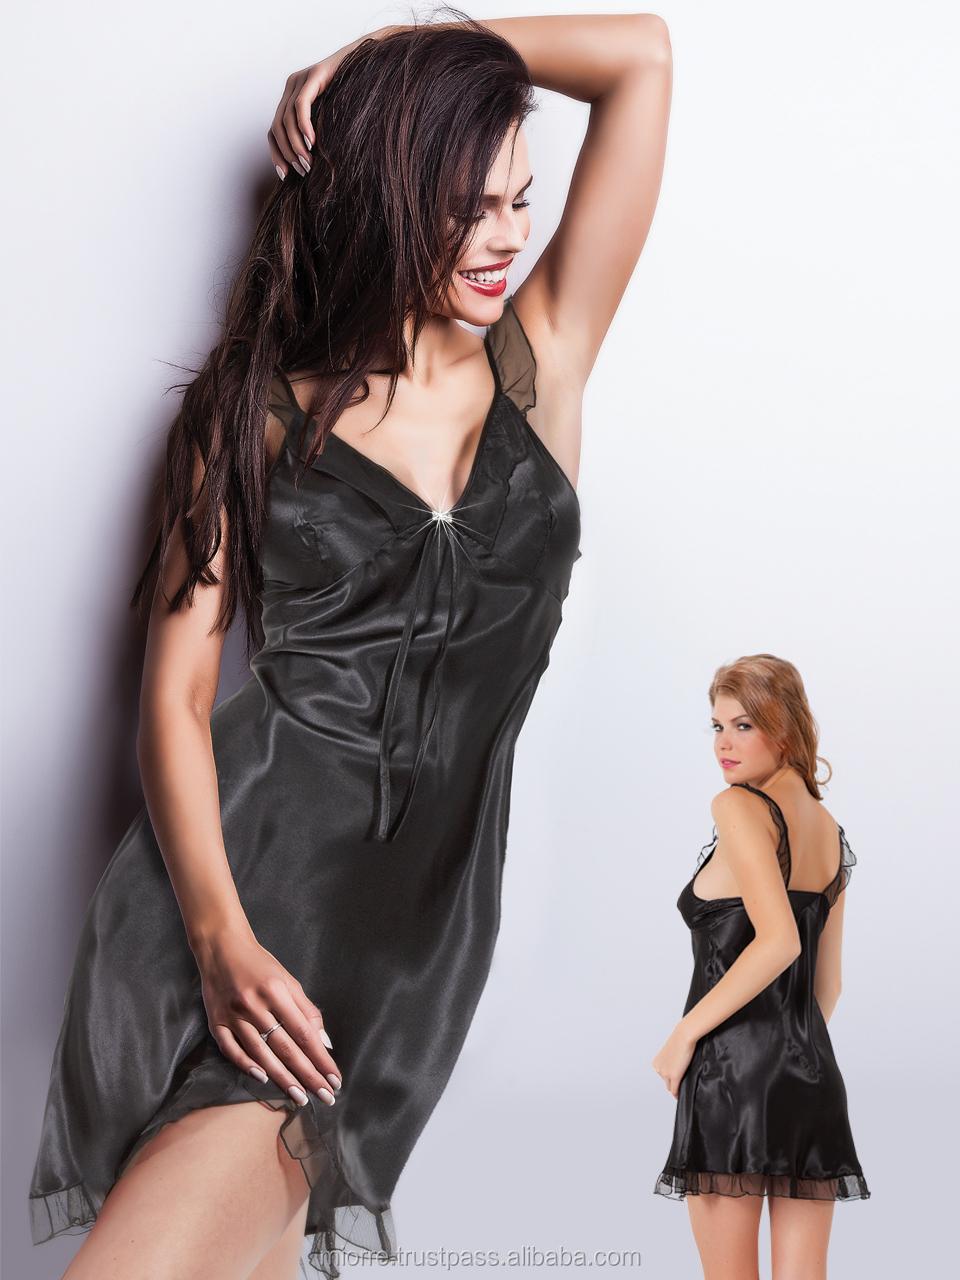 f9377bbb4 Miorre Satin Lingerie ( New Price ) (sale ) - Buy Sexy Satin ...